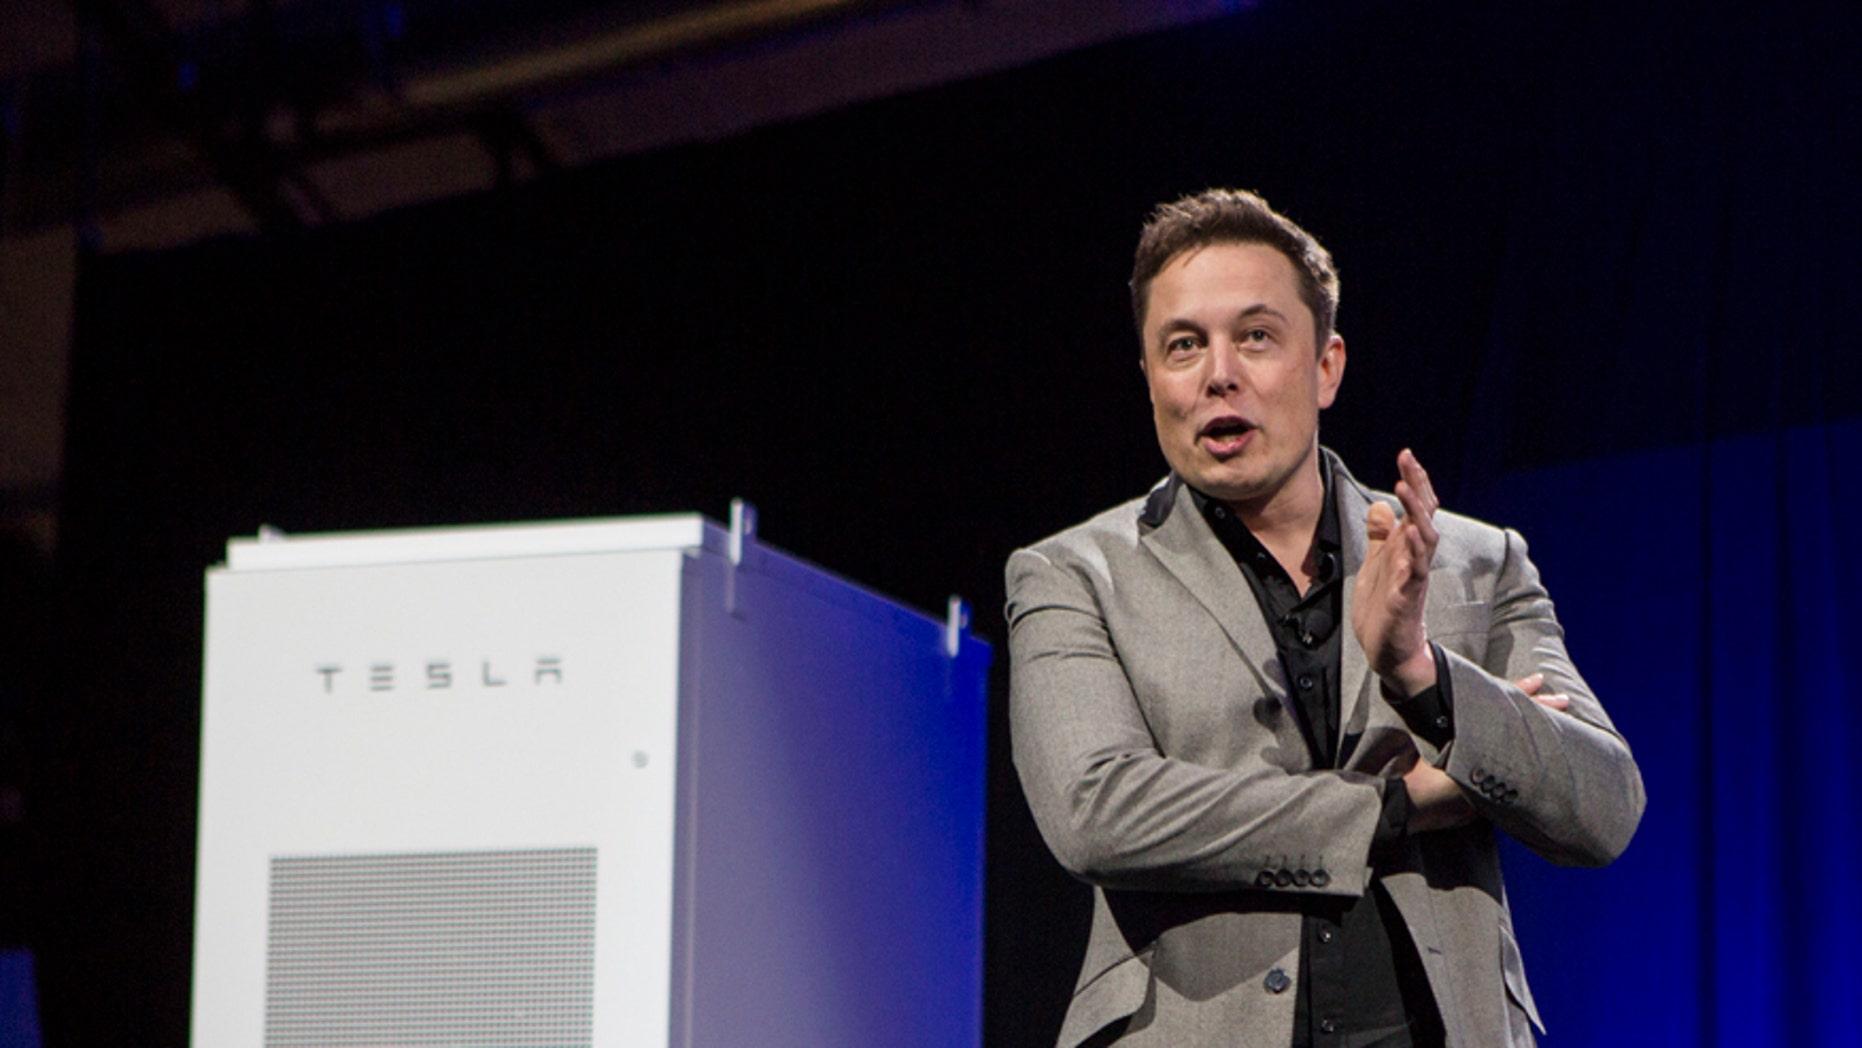 File photo - Elon Musk, CEO of Tesla Motors Inc., unveils the company's Powerpack in Hawthorne, Calif., Thursday, April. 30, 2015. (AP Photo/Ringo H.W. Chiu)